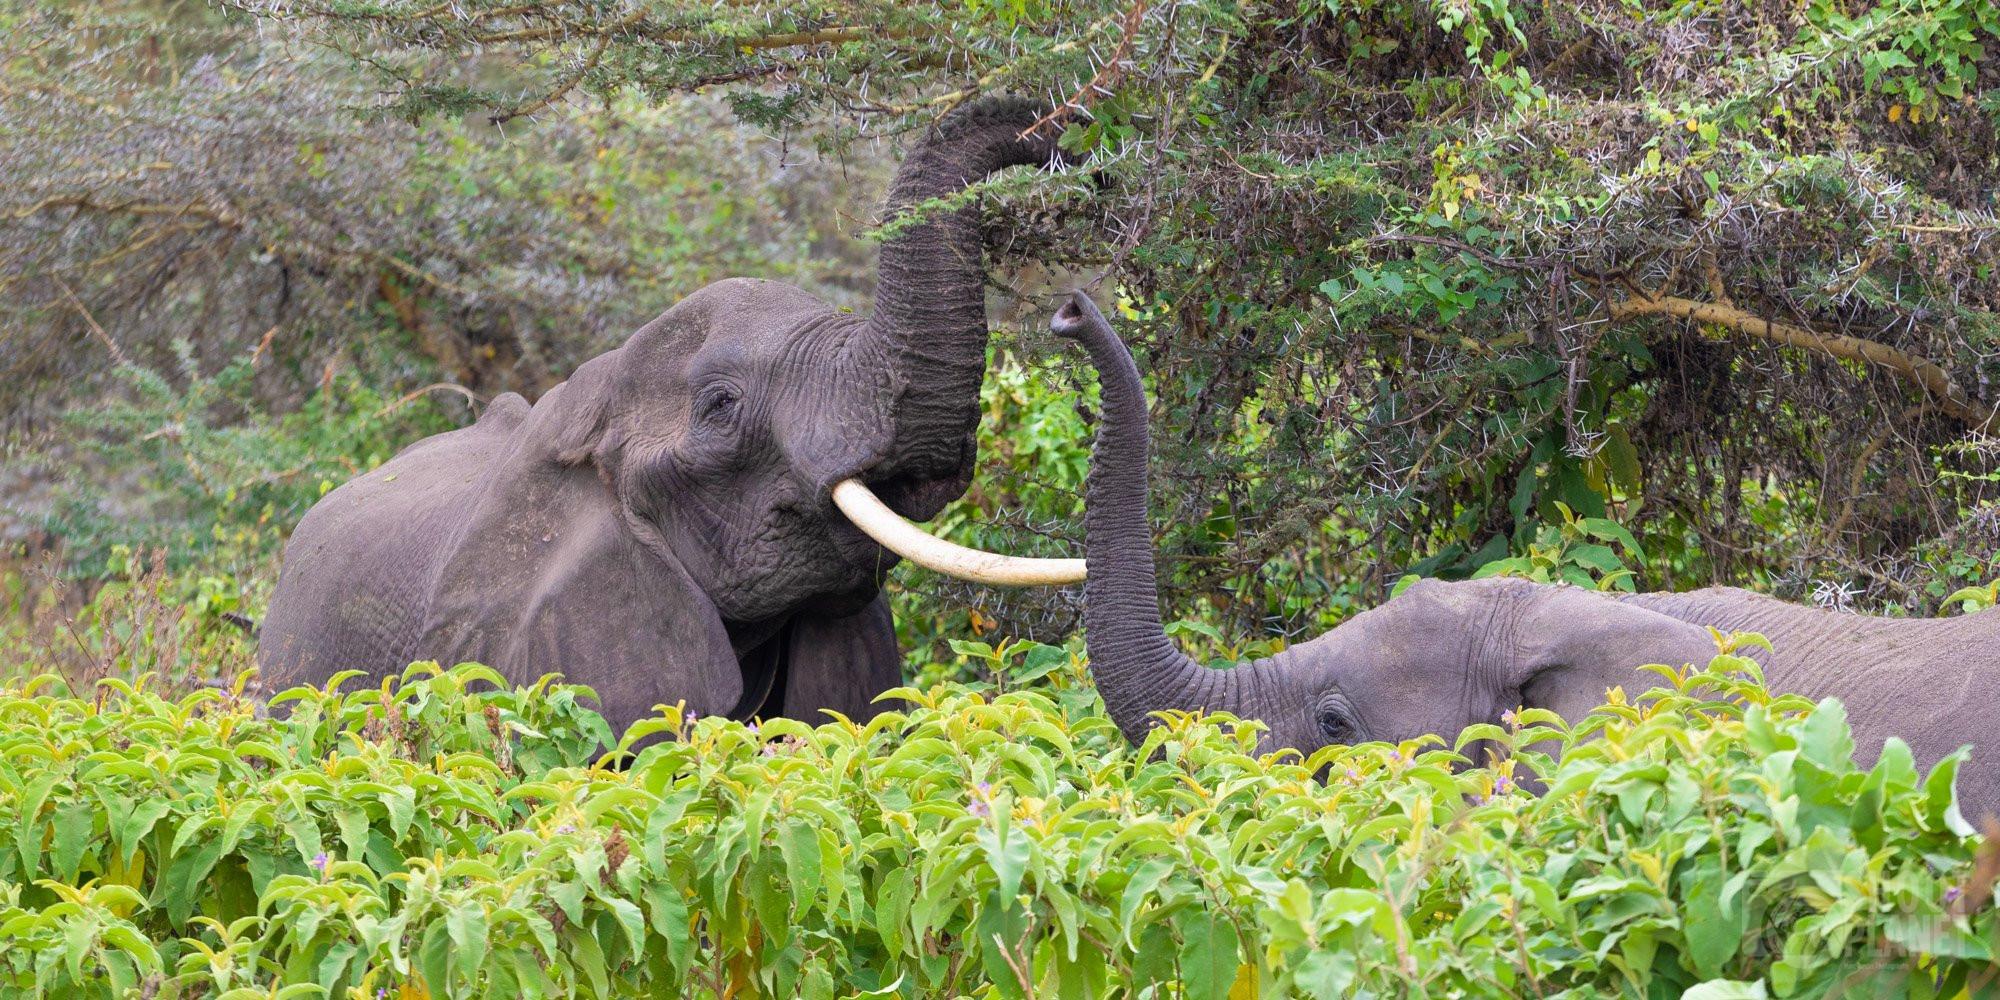 Elephants in Ngorongoro crater forest, Tanzania